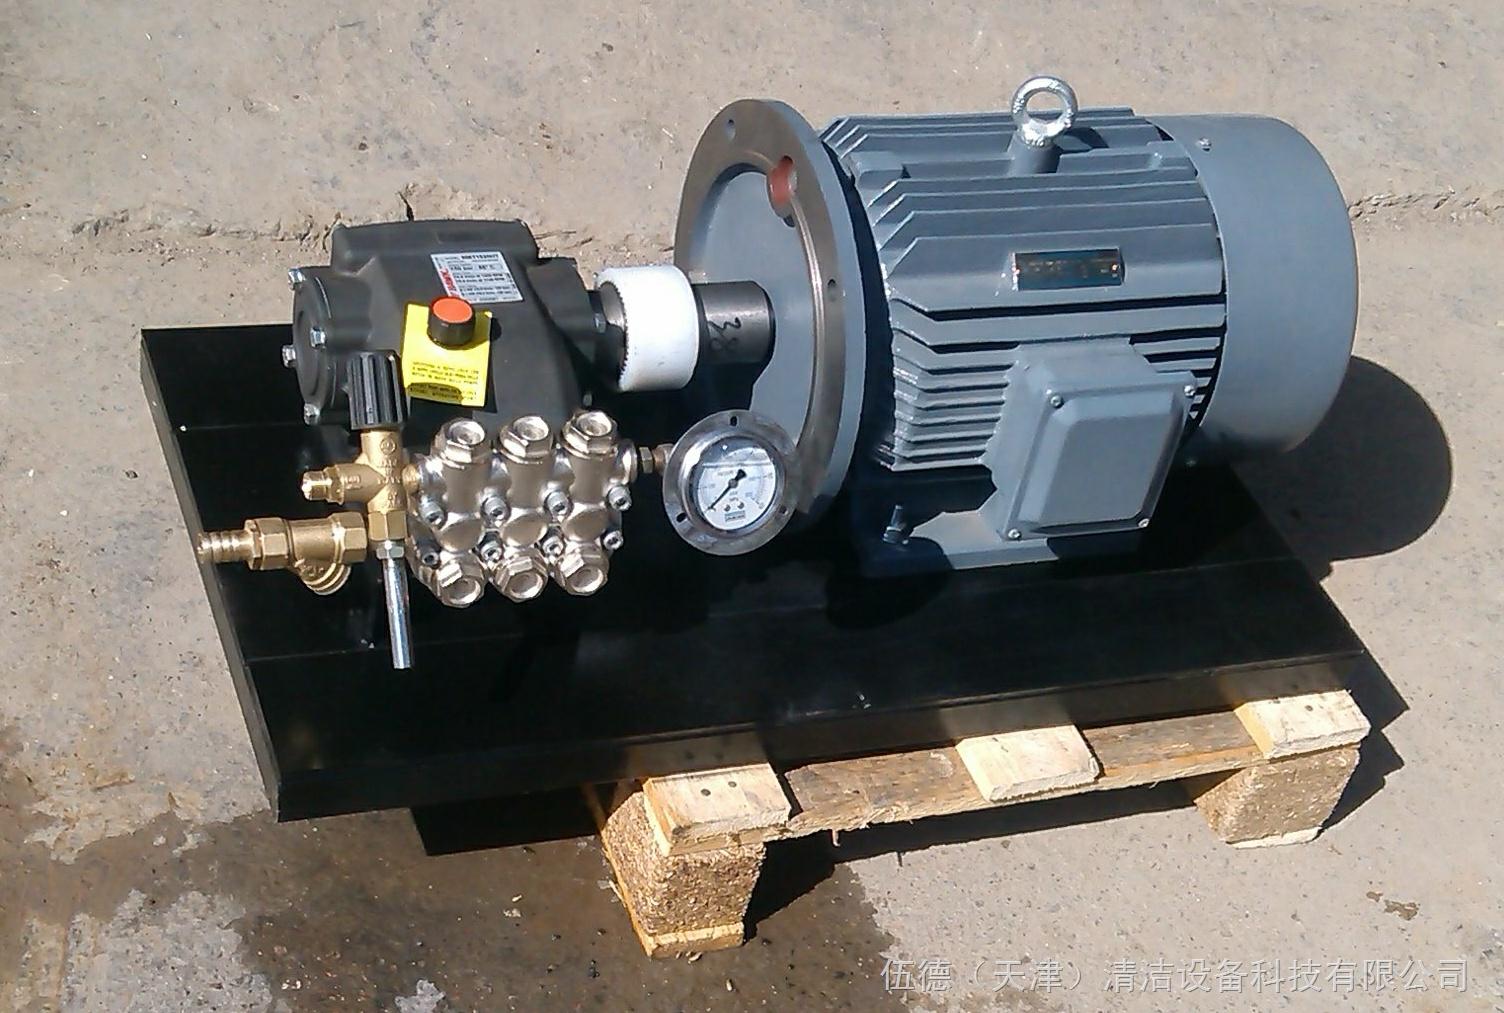 DL1515-德利高压热水清洗机